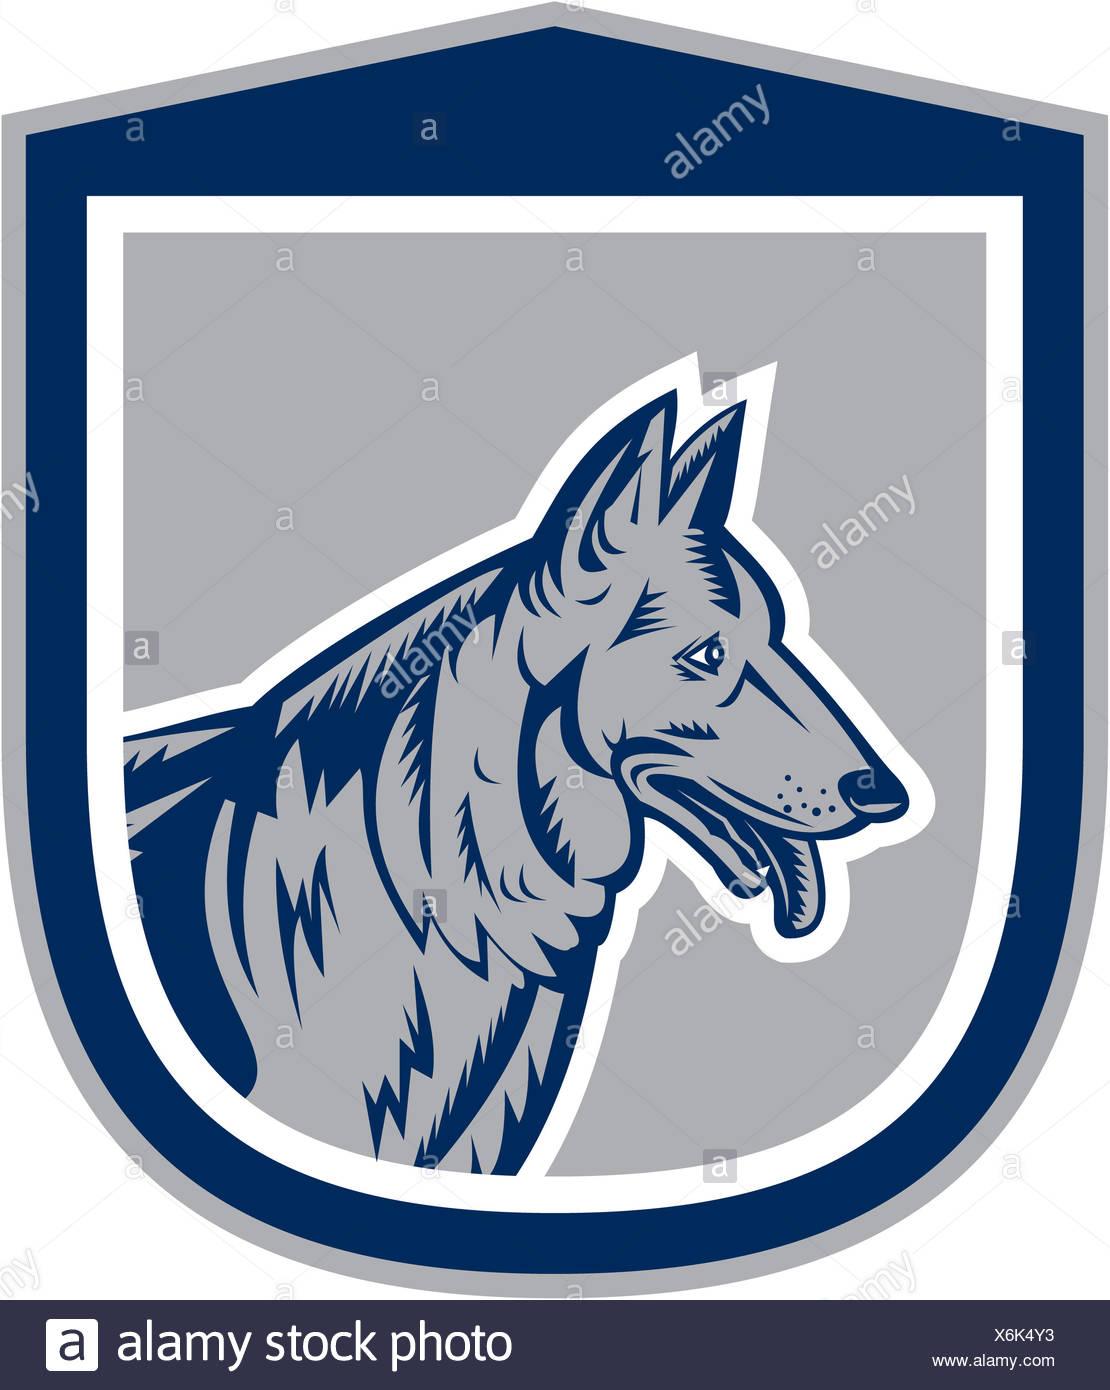 German Shepherd Dog Head Shield Woodcut - Stock Image